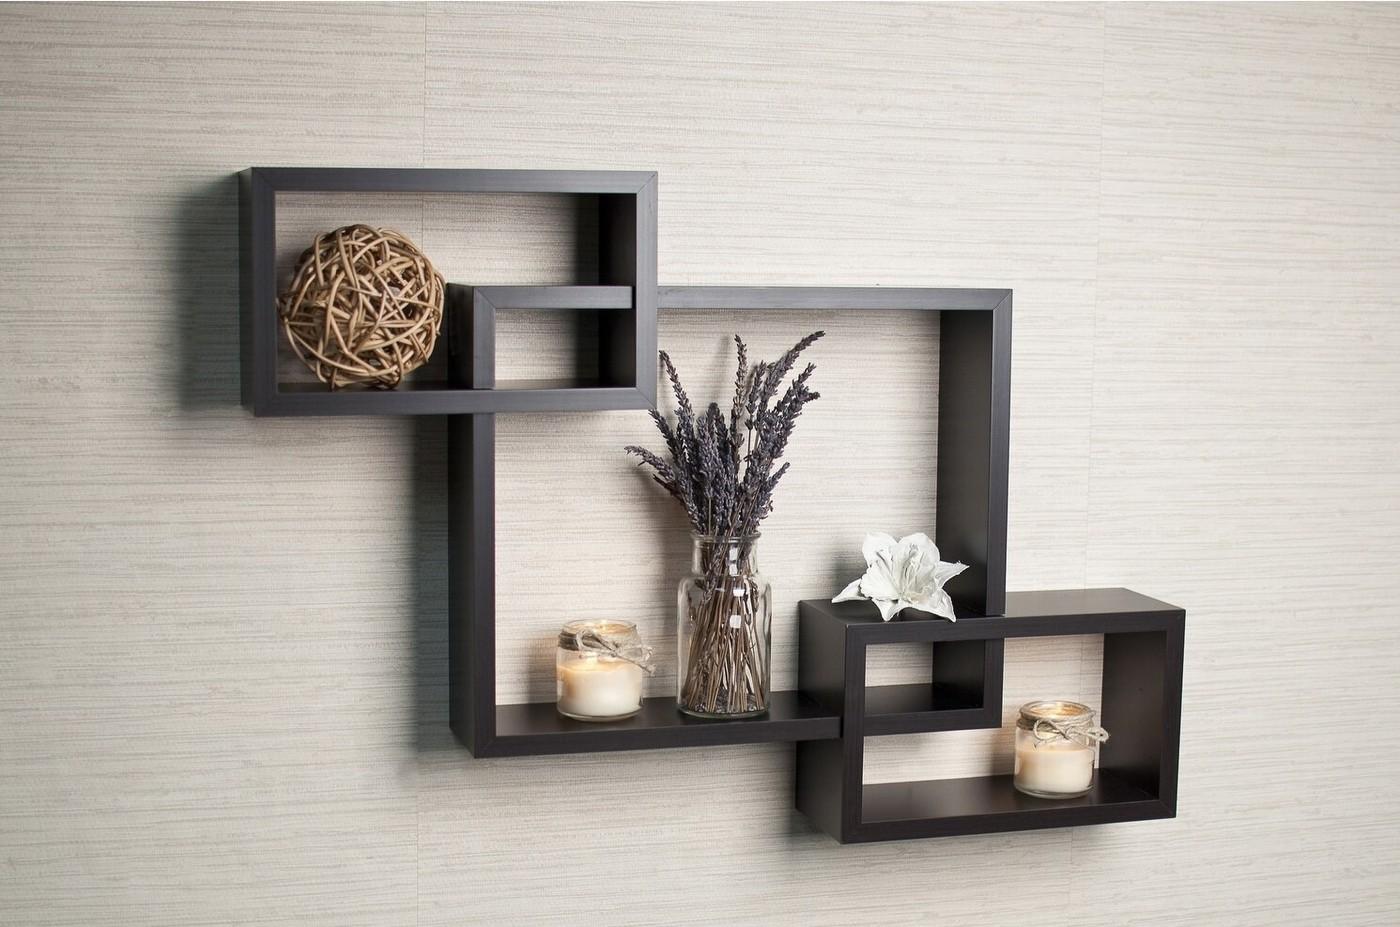 Wood Laminate Connected Box Shelves